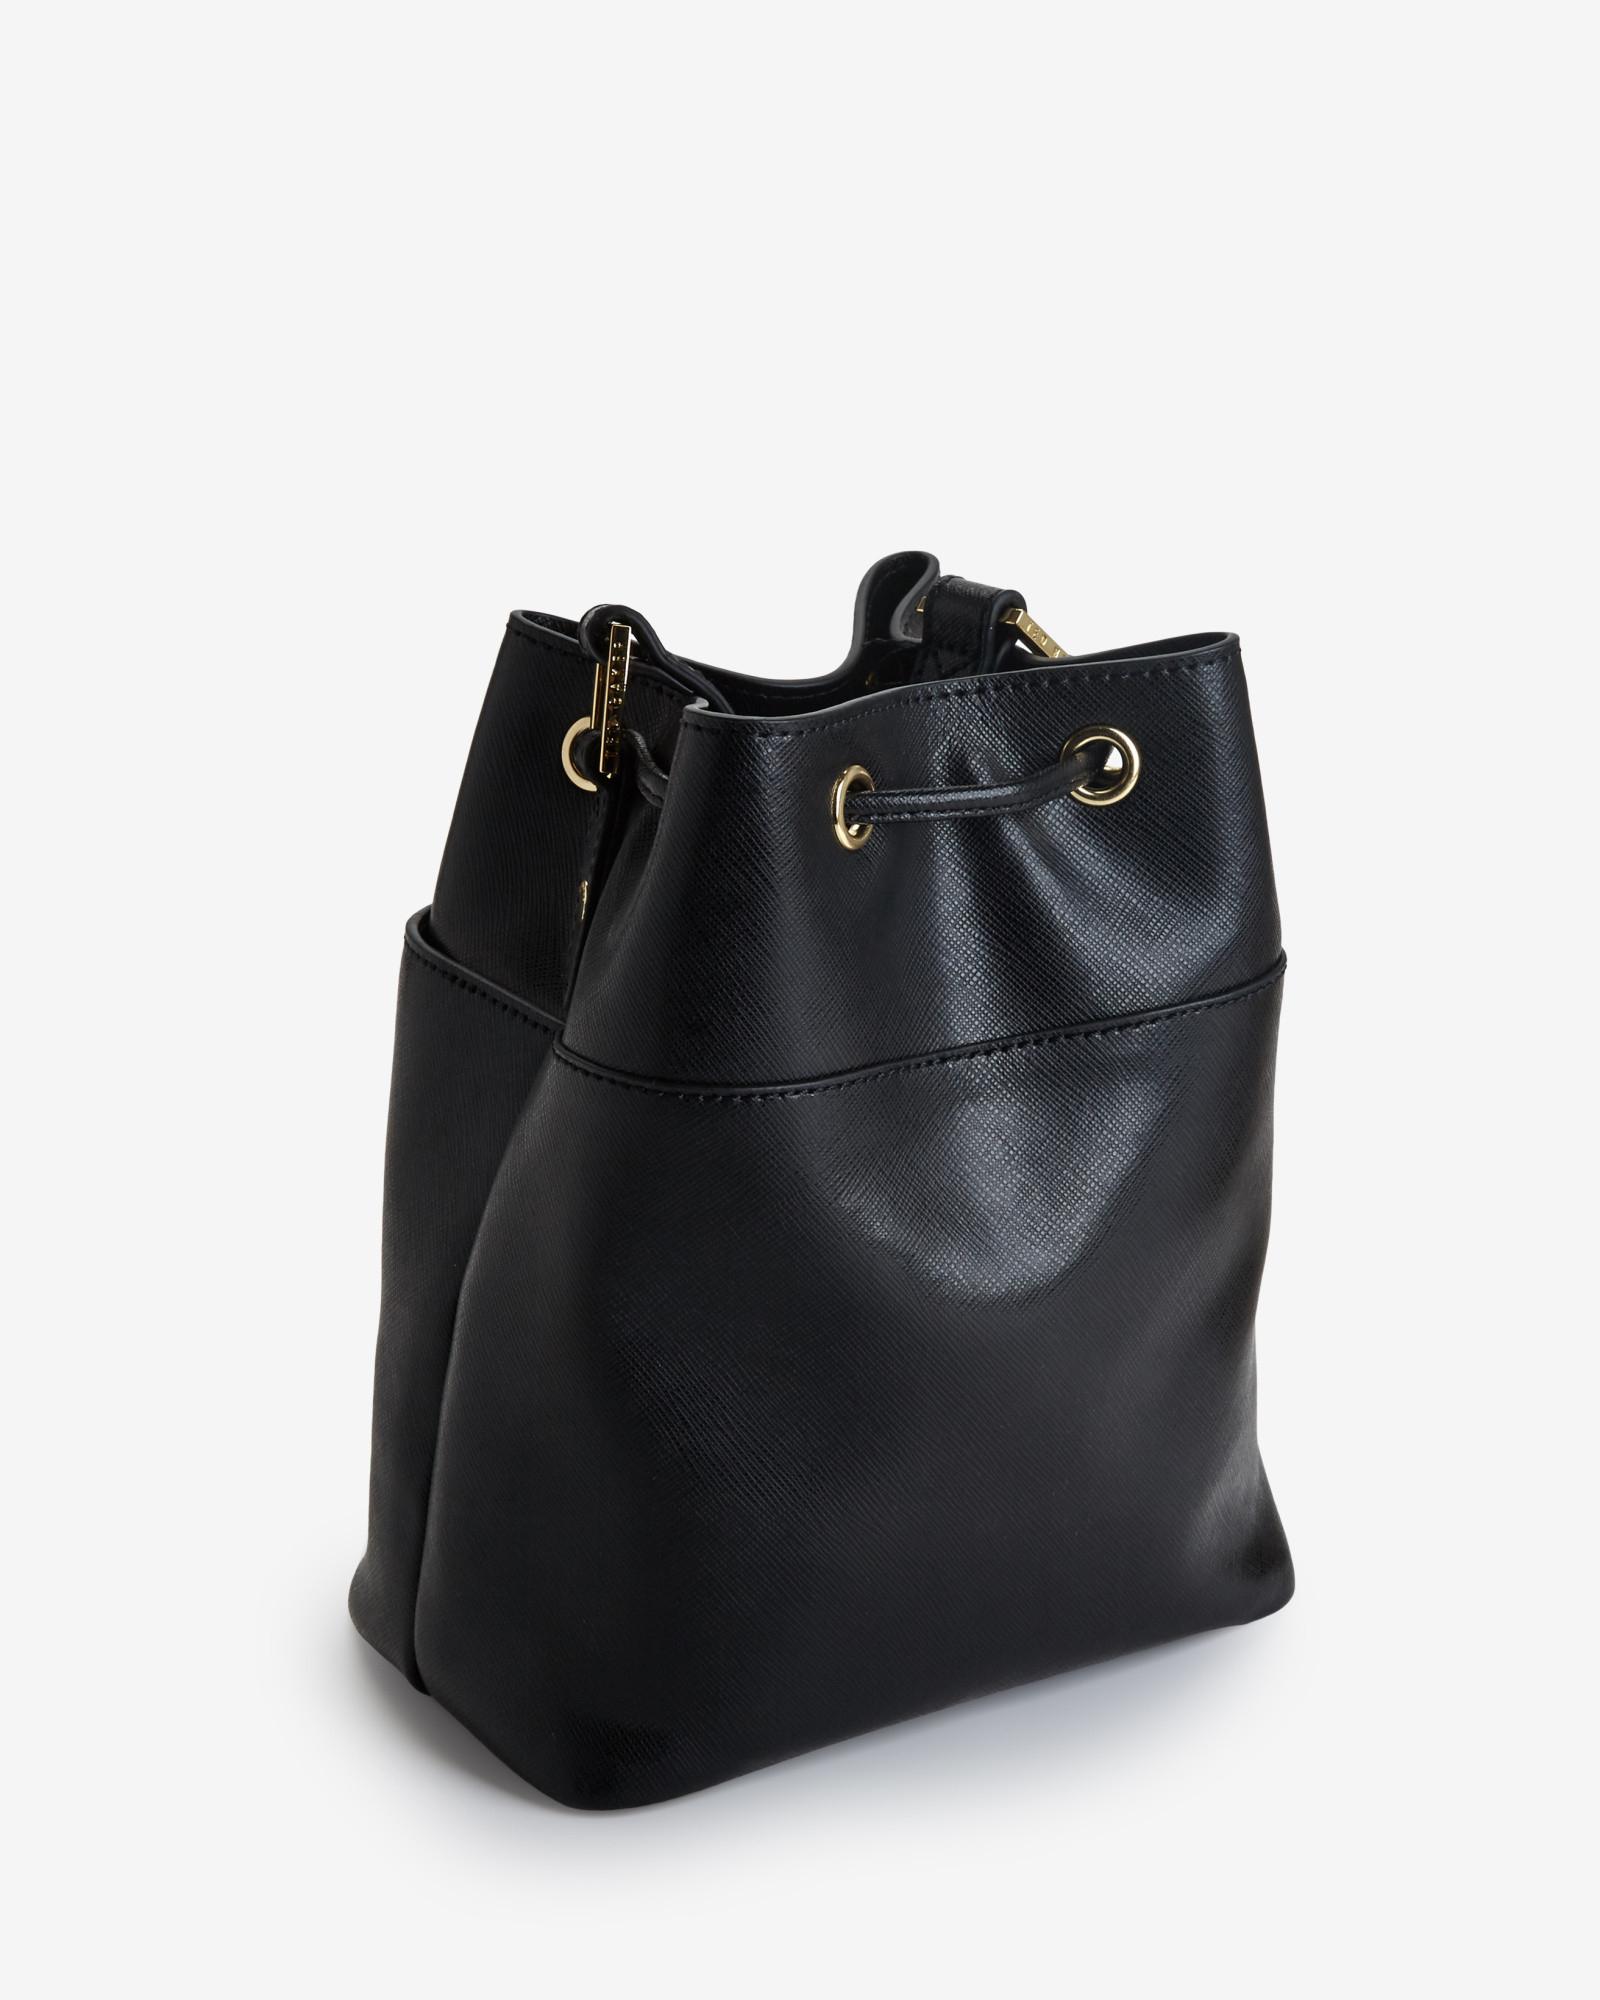 6ebbd836988297 Lyst - Ted Baker Crosshatch Leather Mini Bucket Bag in Black